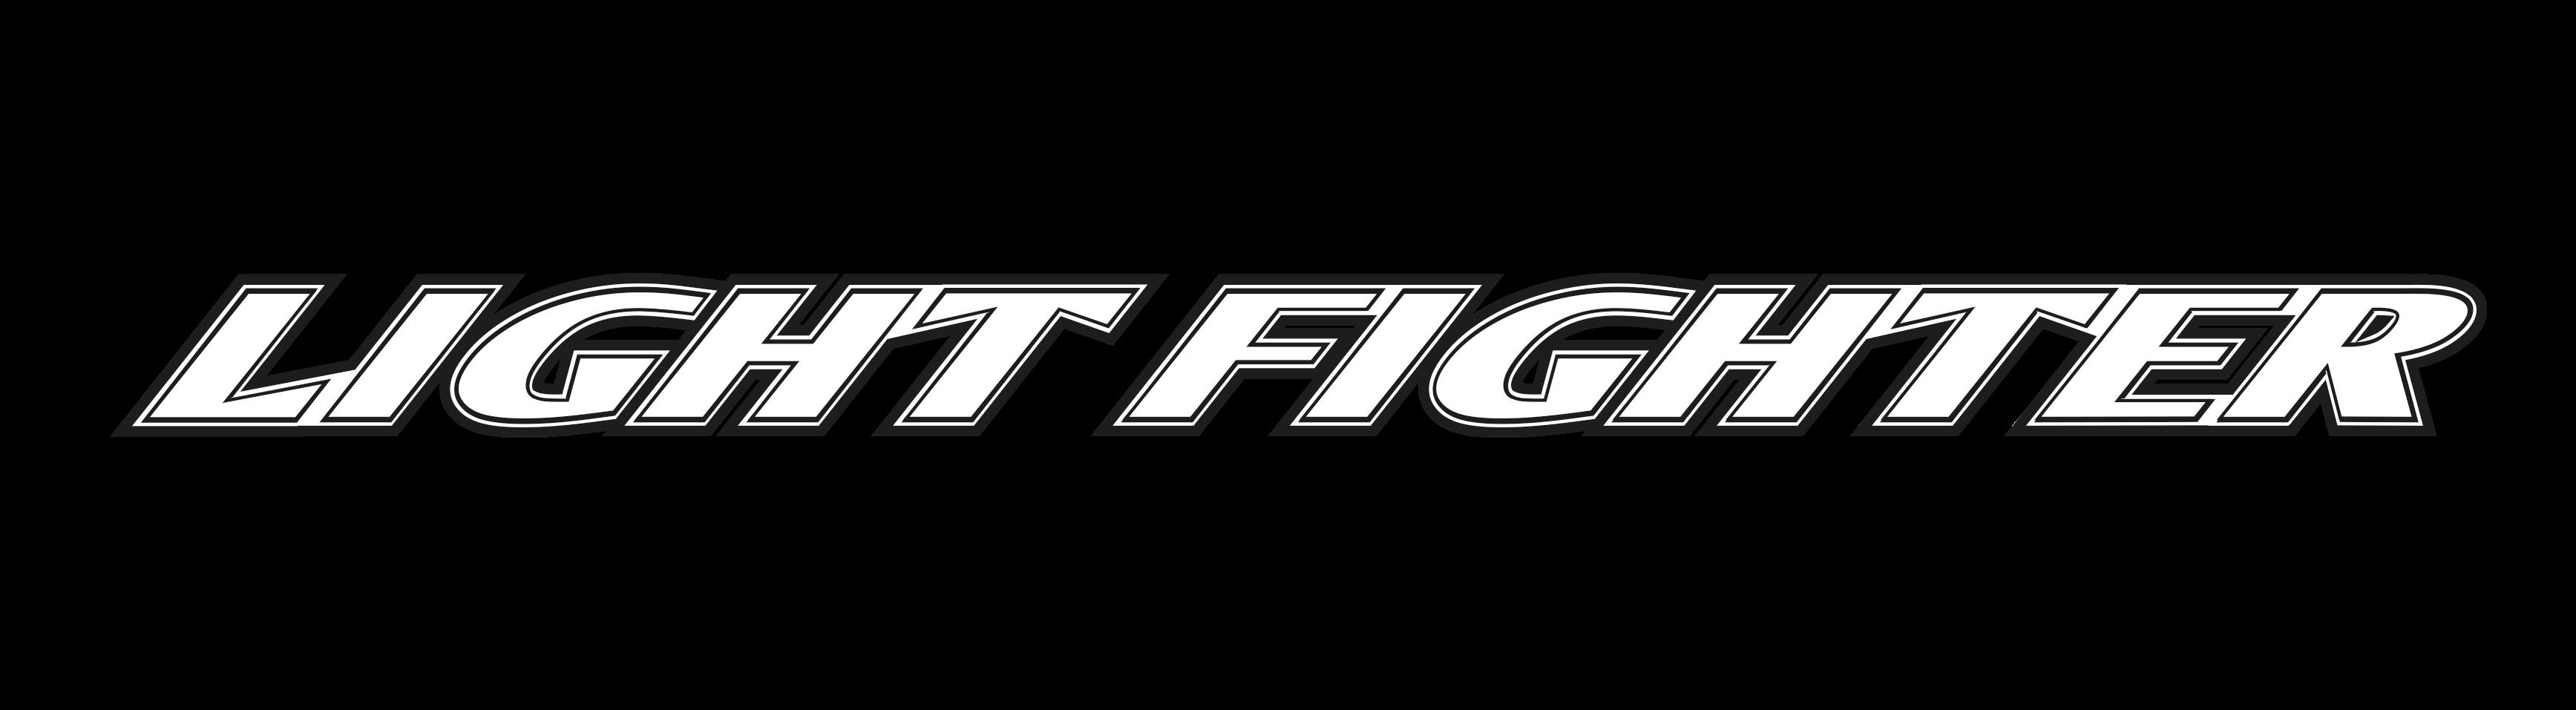 Lightfighter